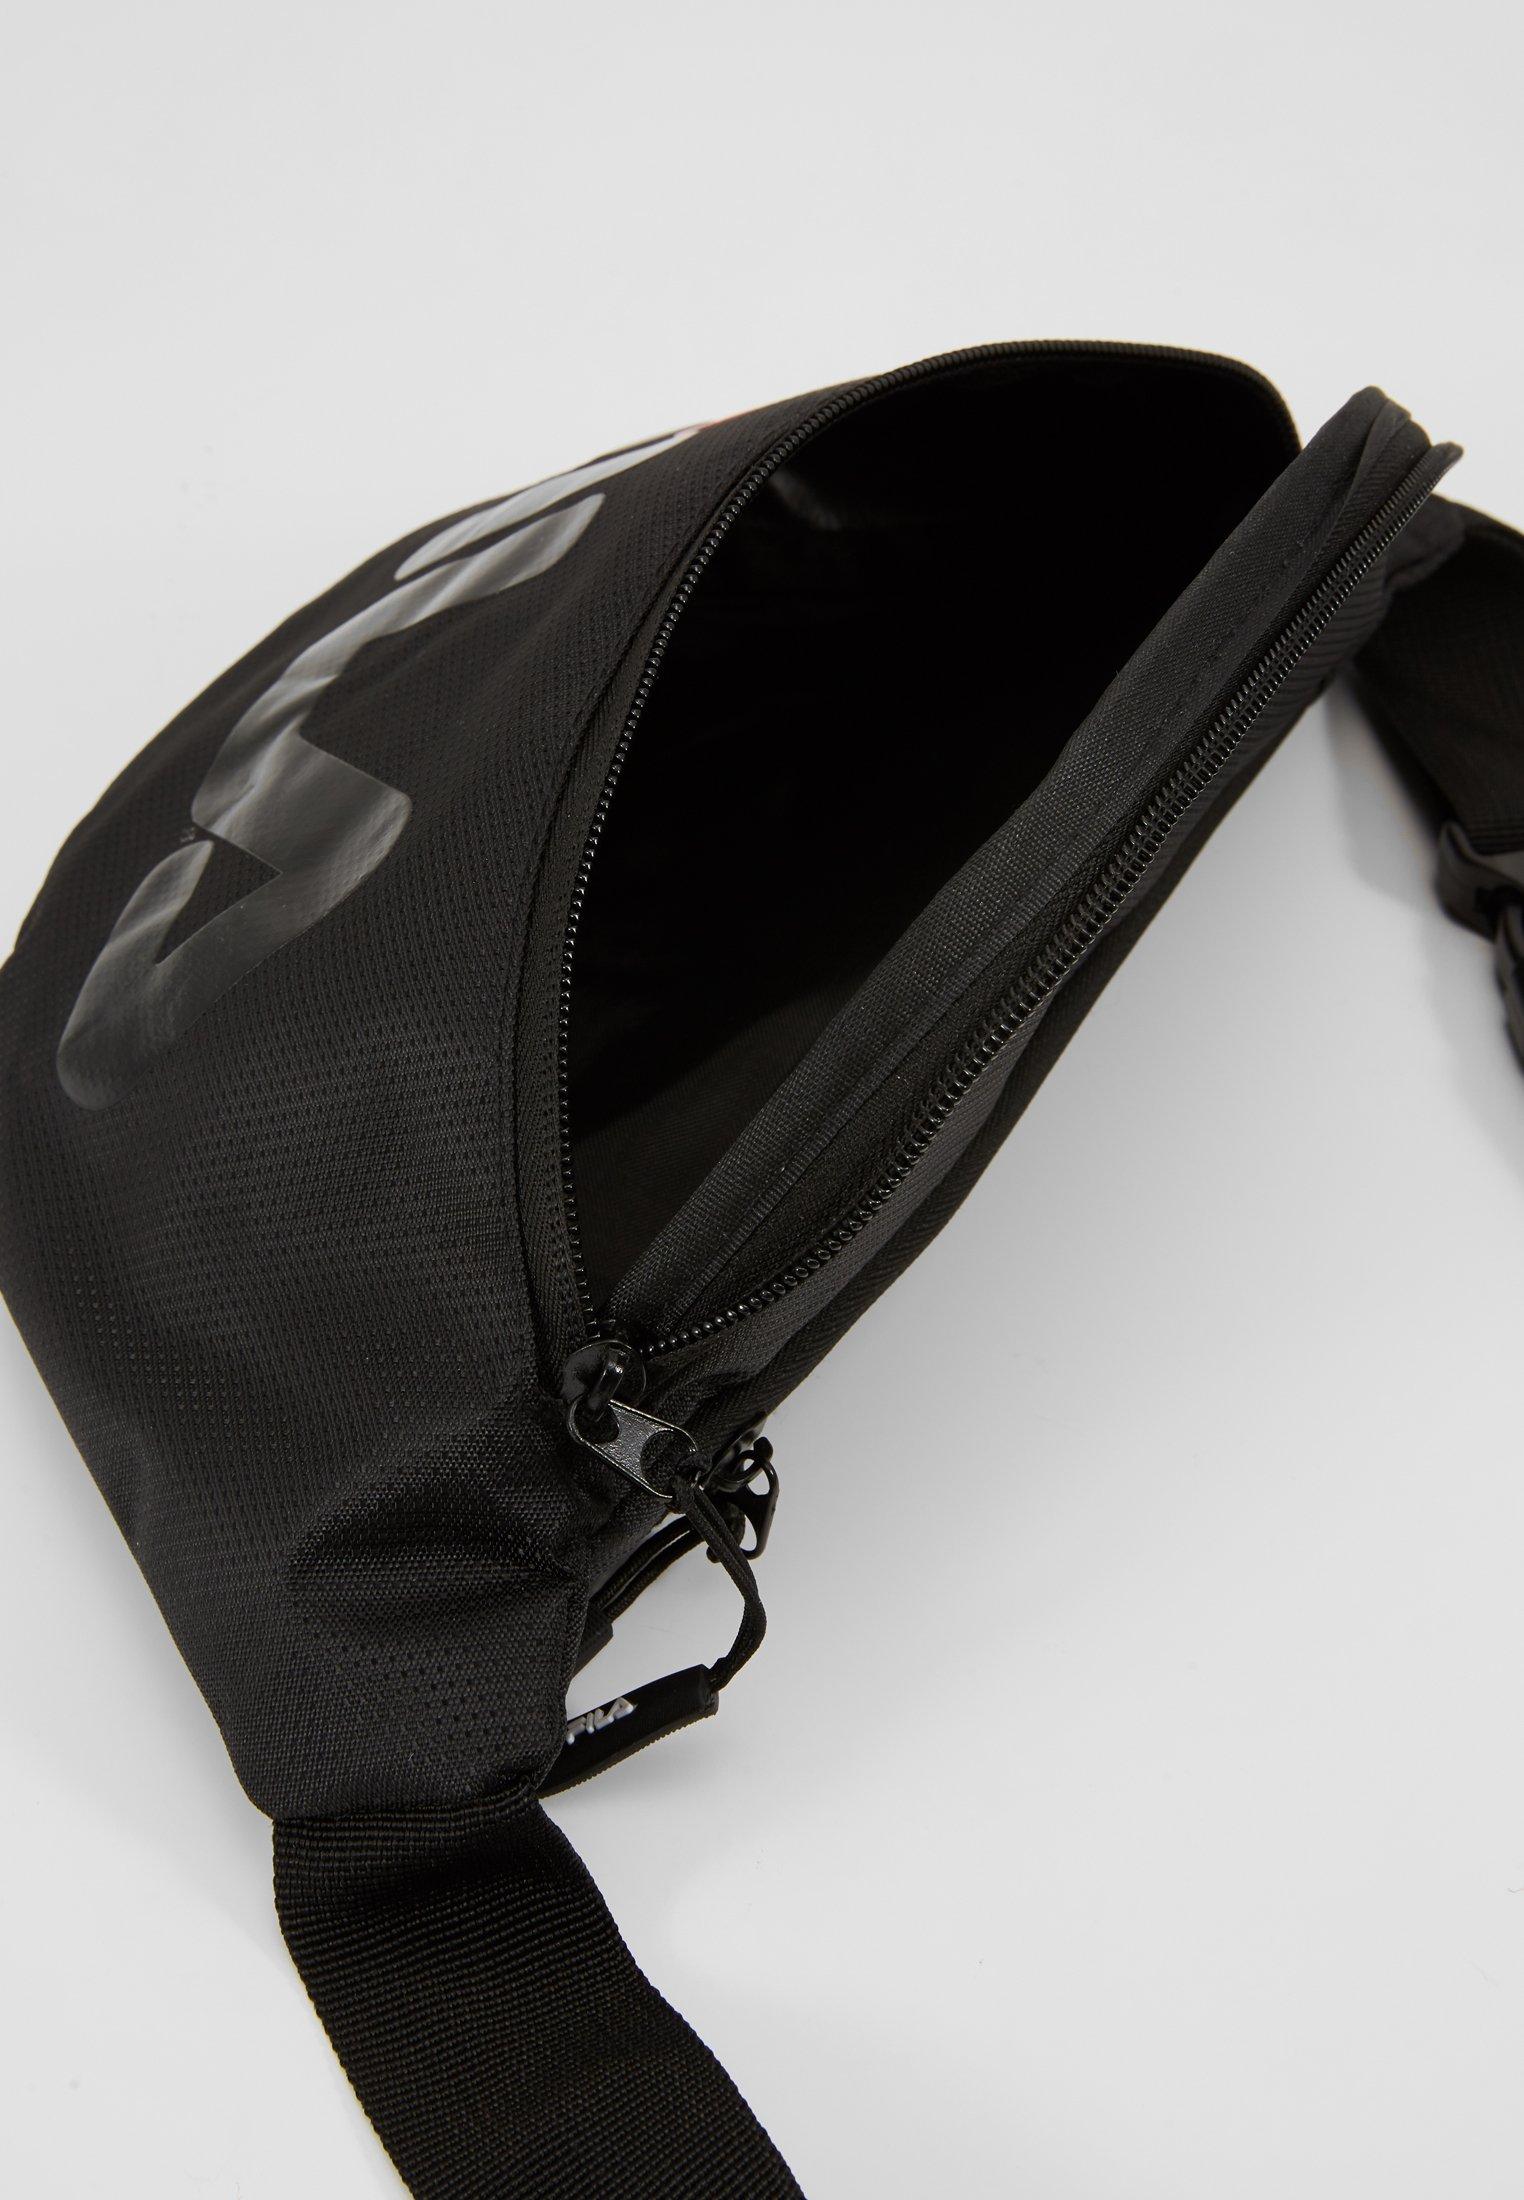 Black Fila Black MartiaMarsupio Bag MartiaMarsupio Belt MartiaMarsupio Bag Belt Fila Bag Belt Fila MjqzSpLUVG